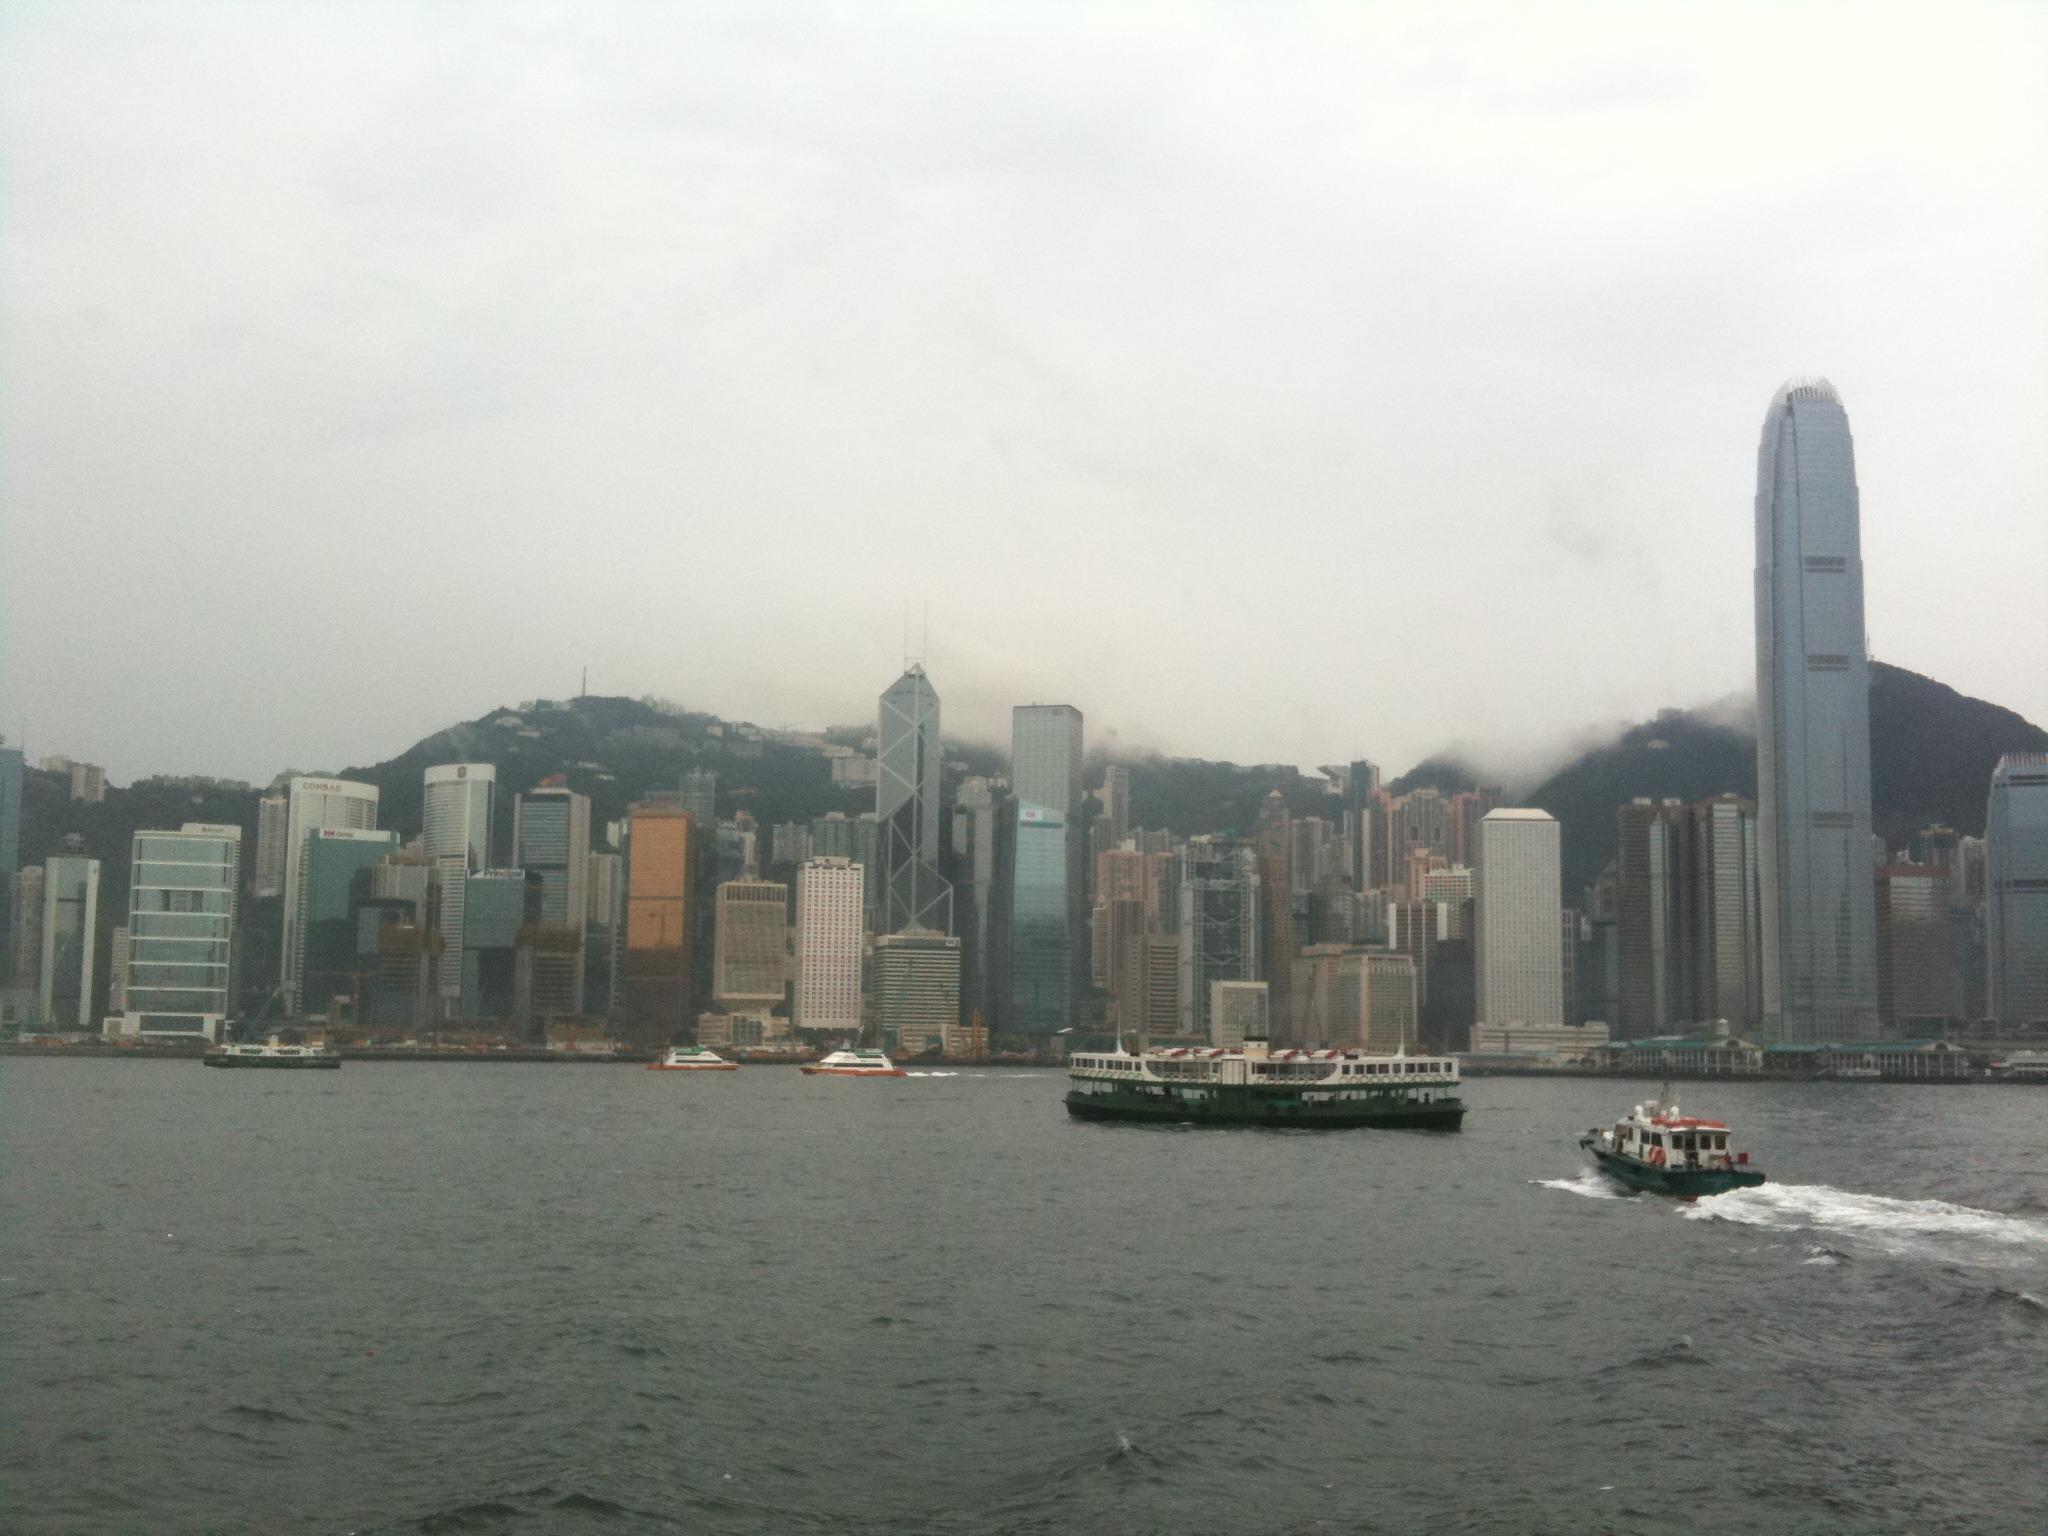 Hong Kong 2010 - Mobile Pics